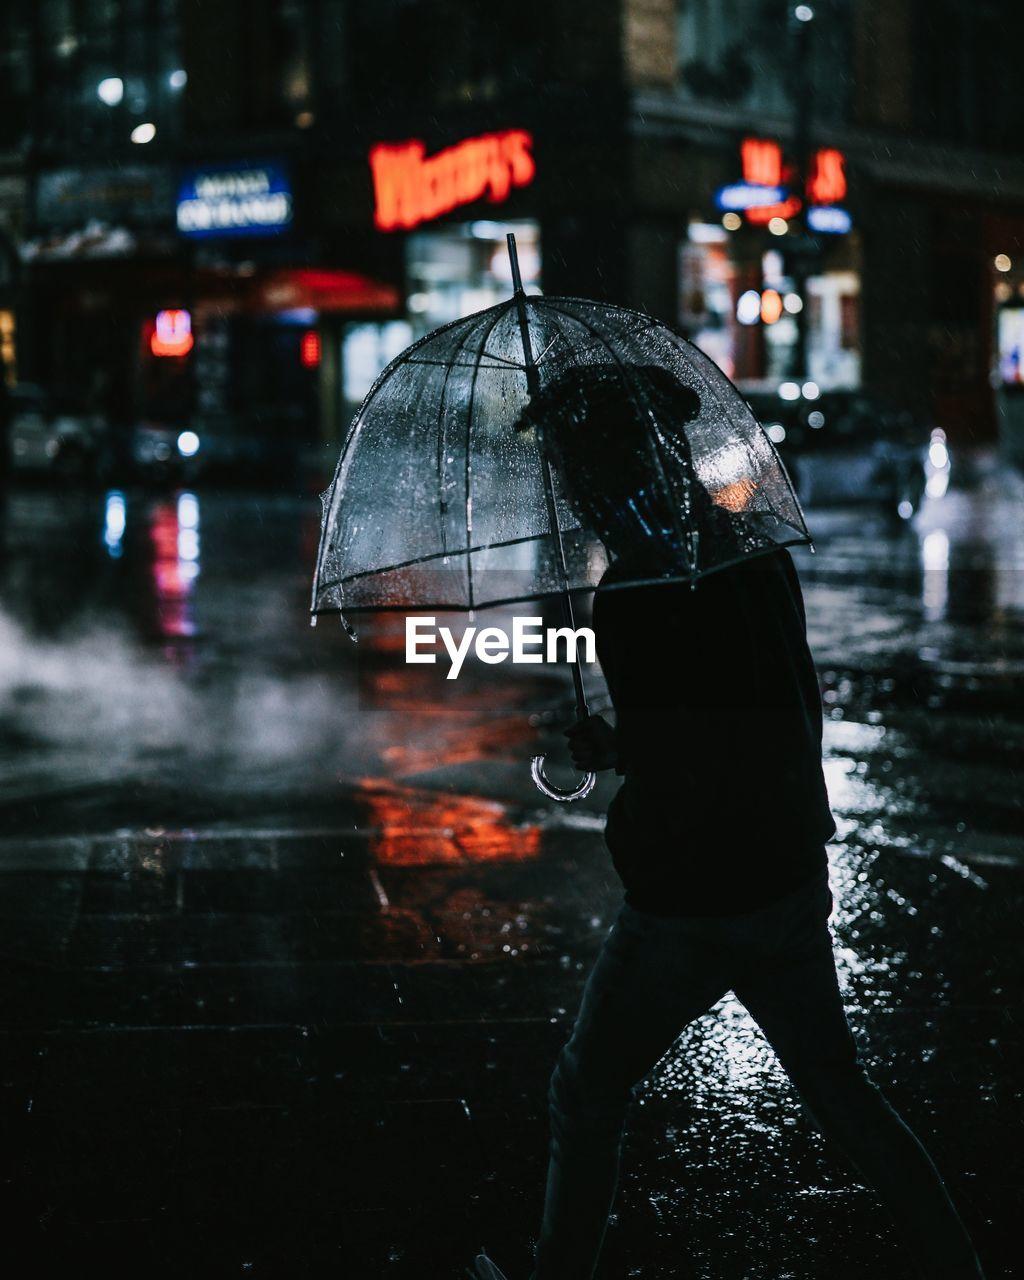 Reflection in city during rainy season at night